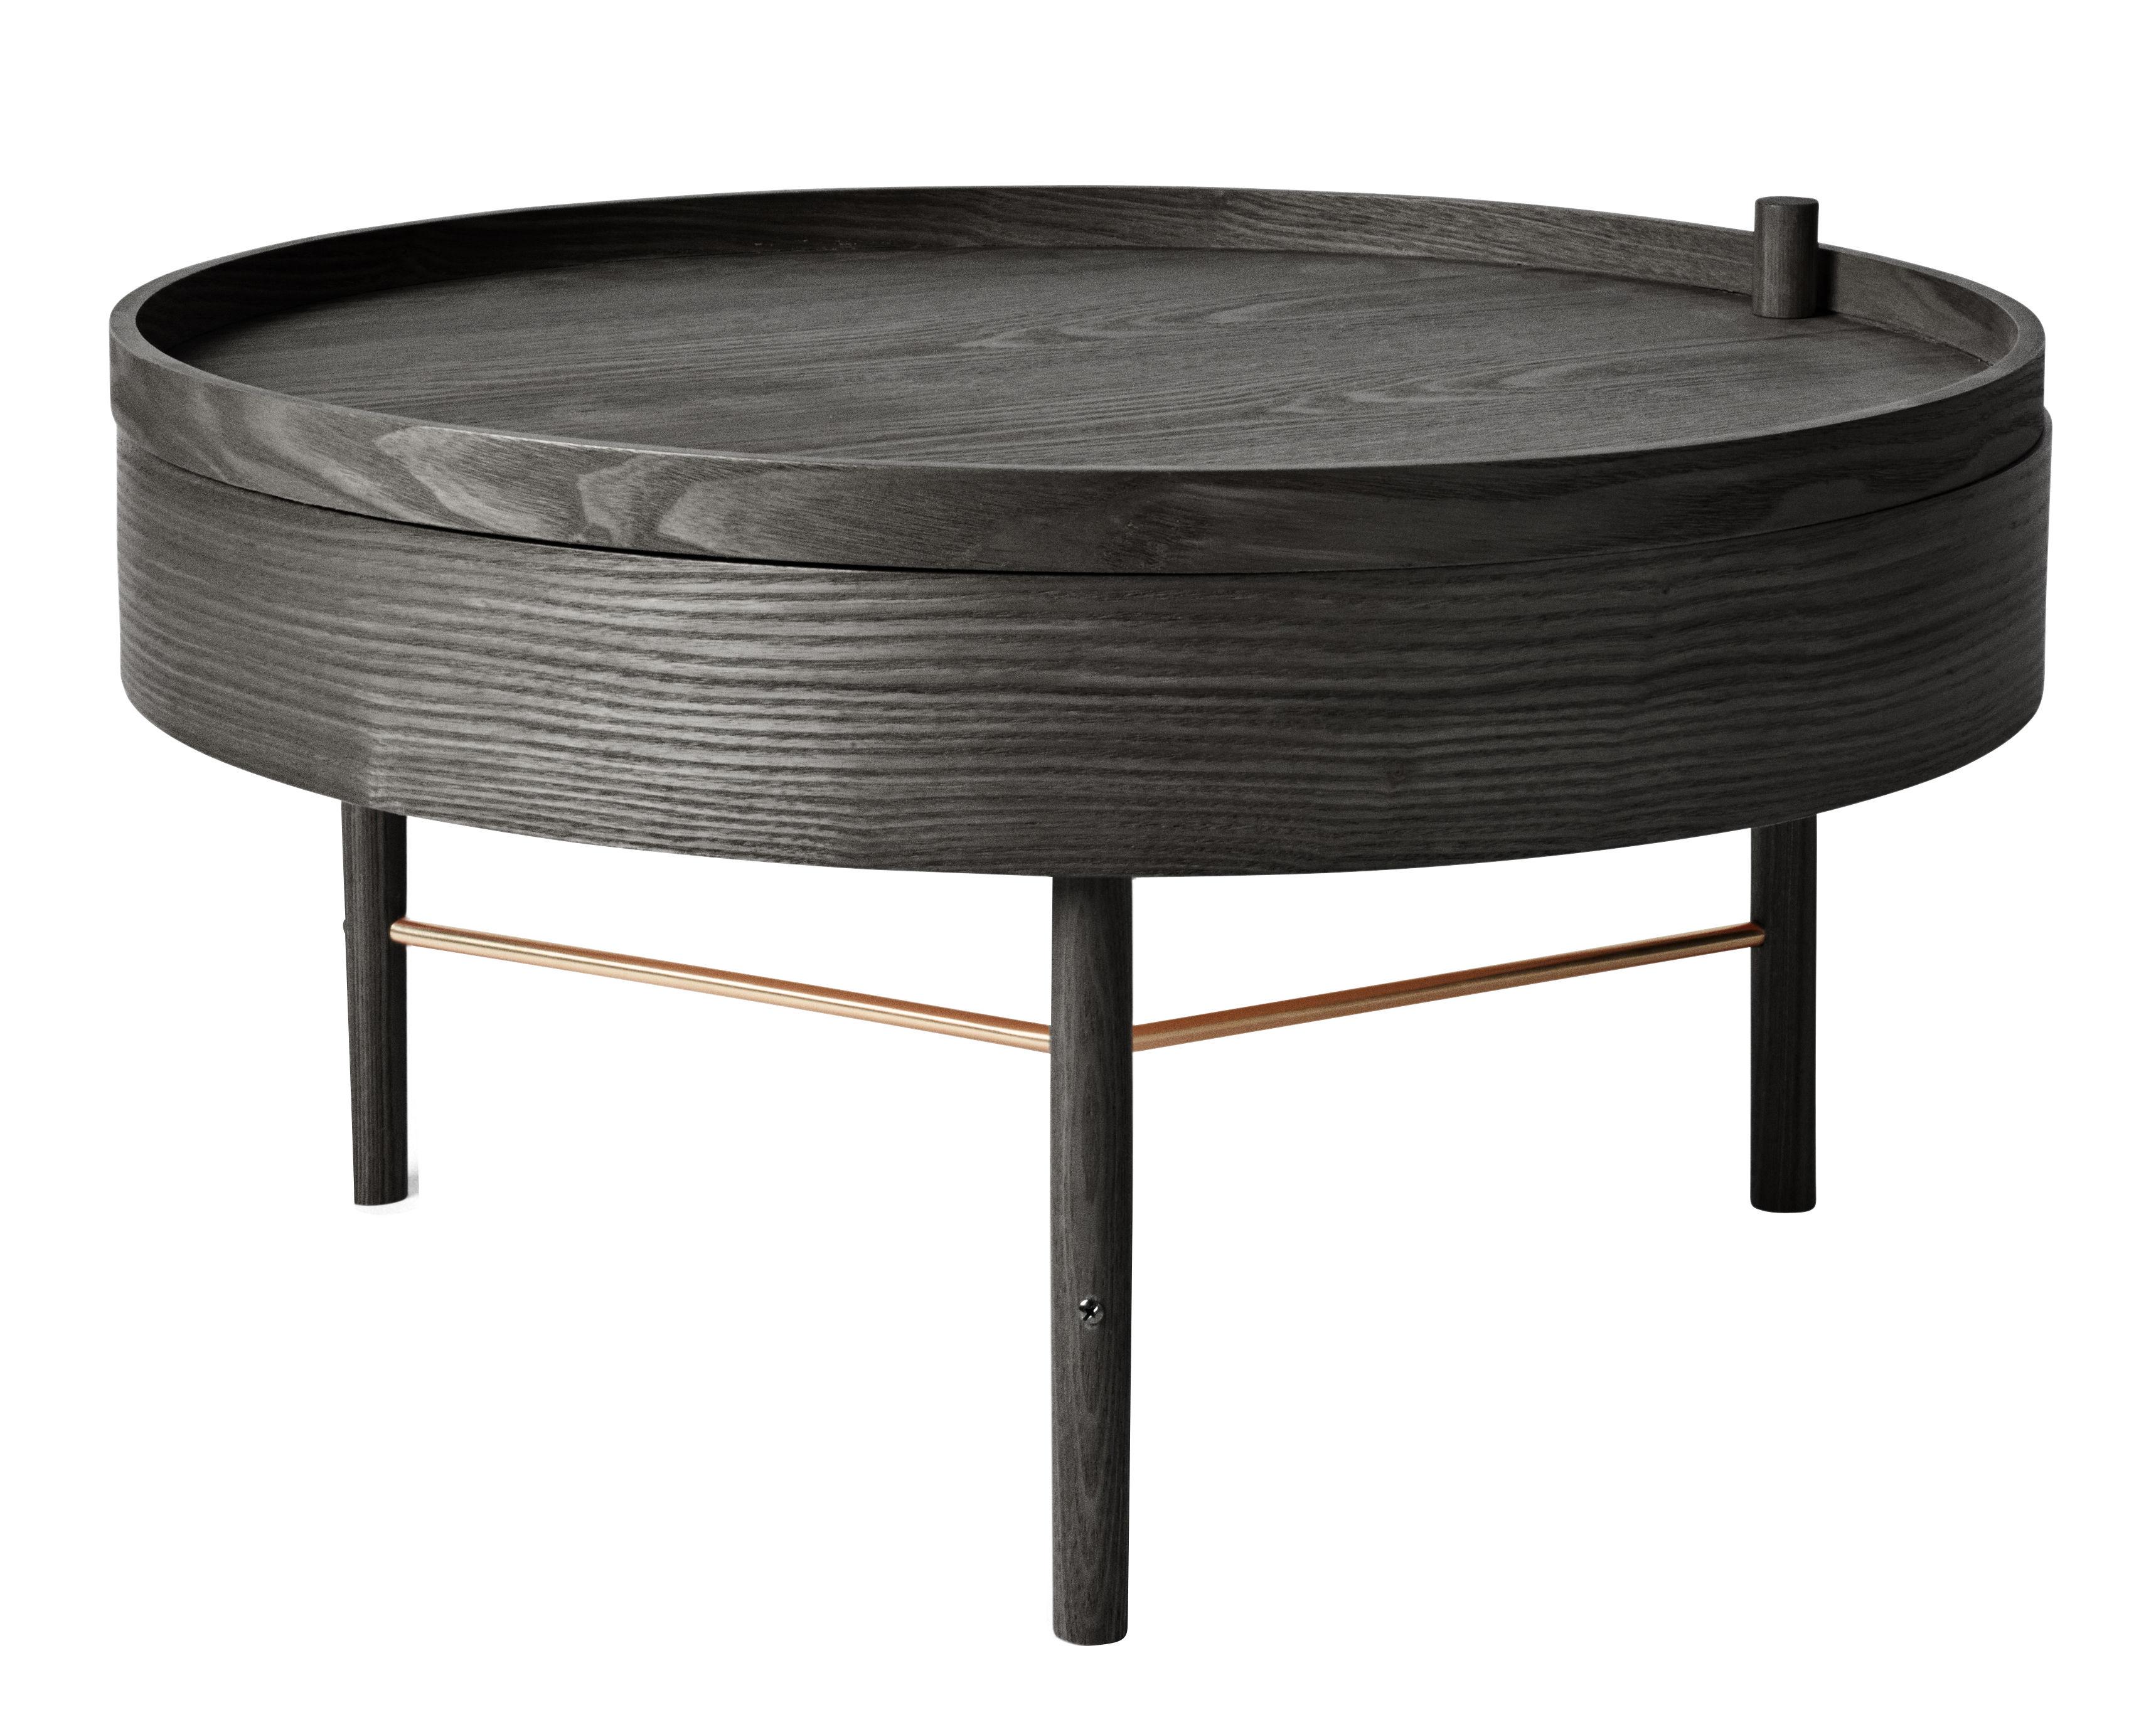 Mobilier - Tables basses - Table basse Turning table / Rangement - Ø 65 cm - Menu - Frêne noir / Tiges laiton - Frêne, Laiton